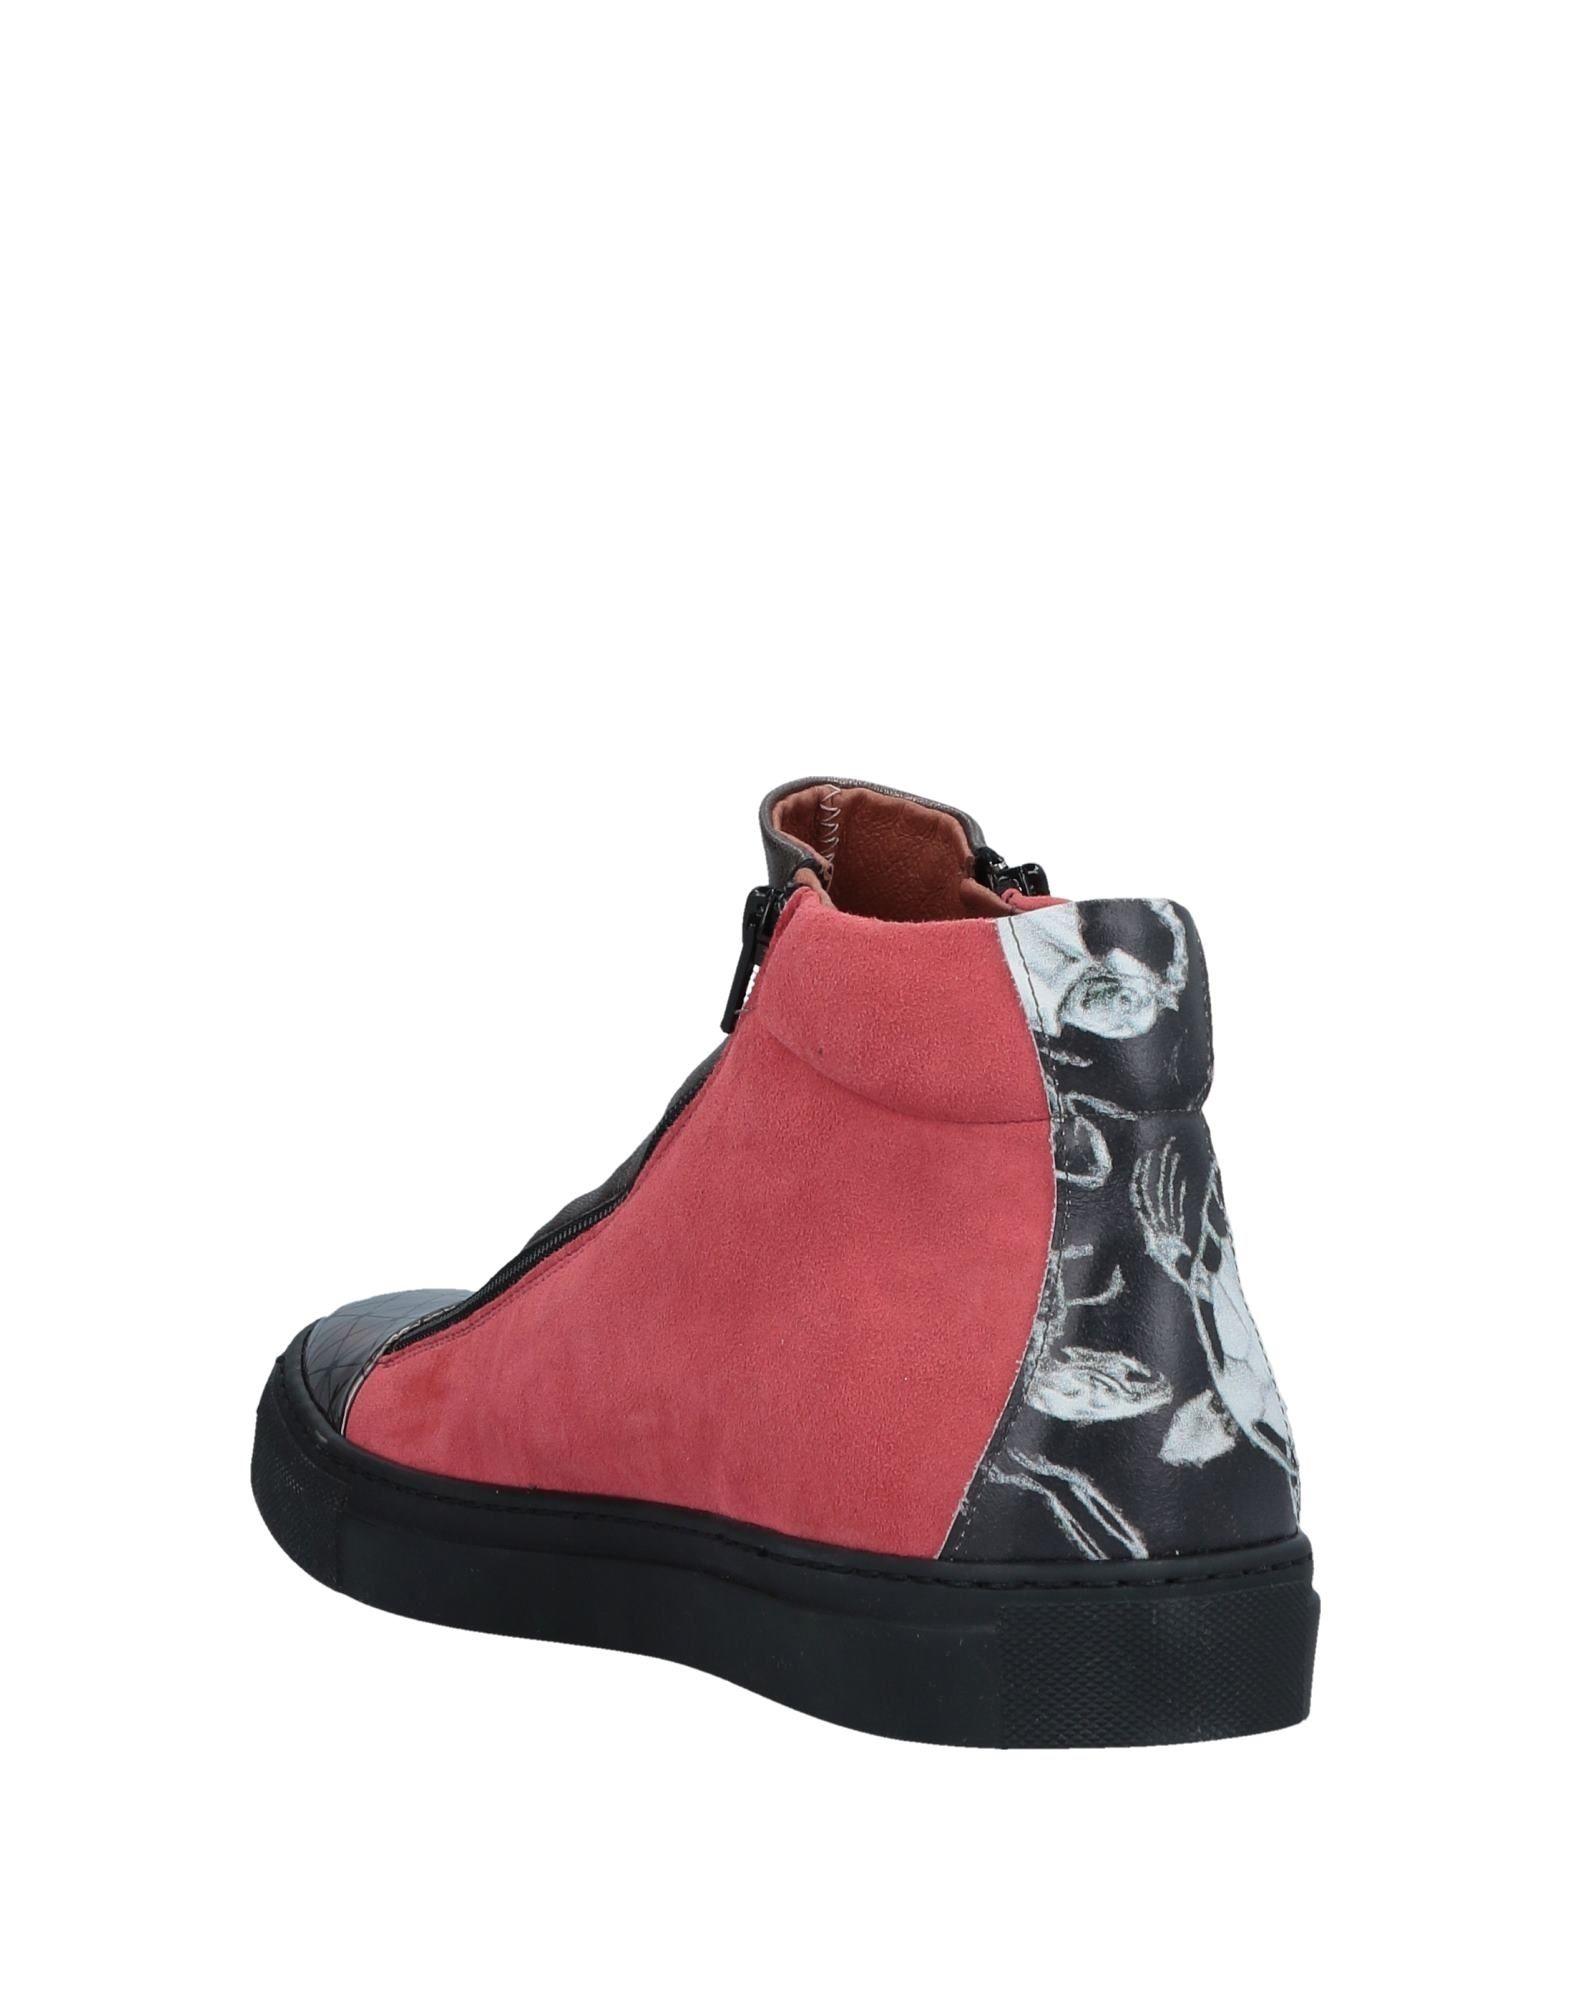 11525540ME Ebarrito Sneakers Herren  11525540ME  5f0220